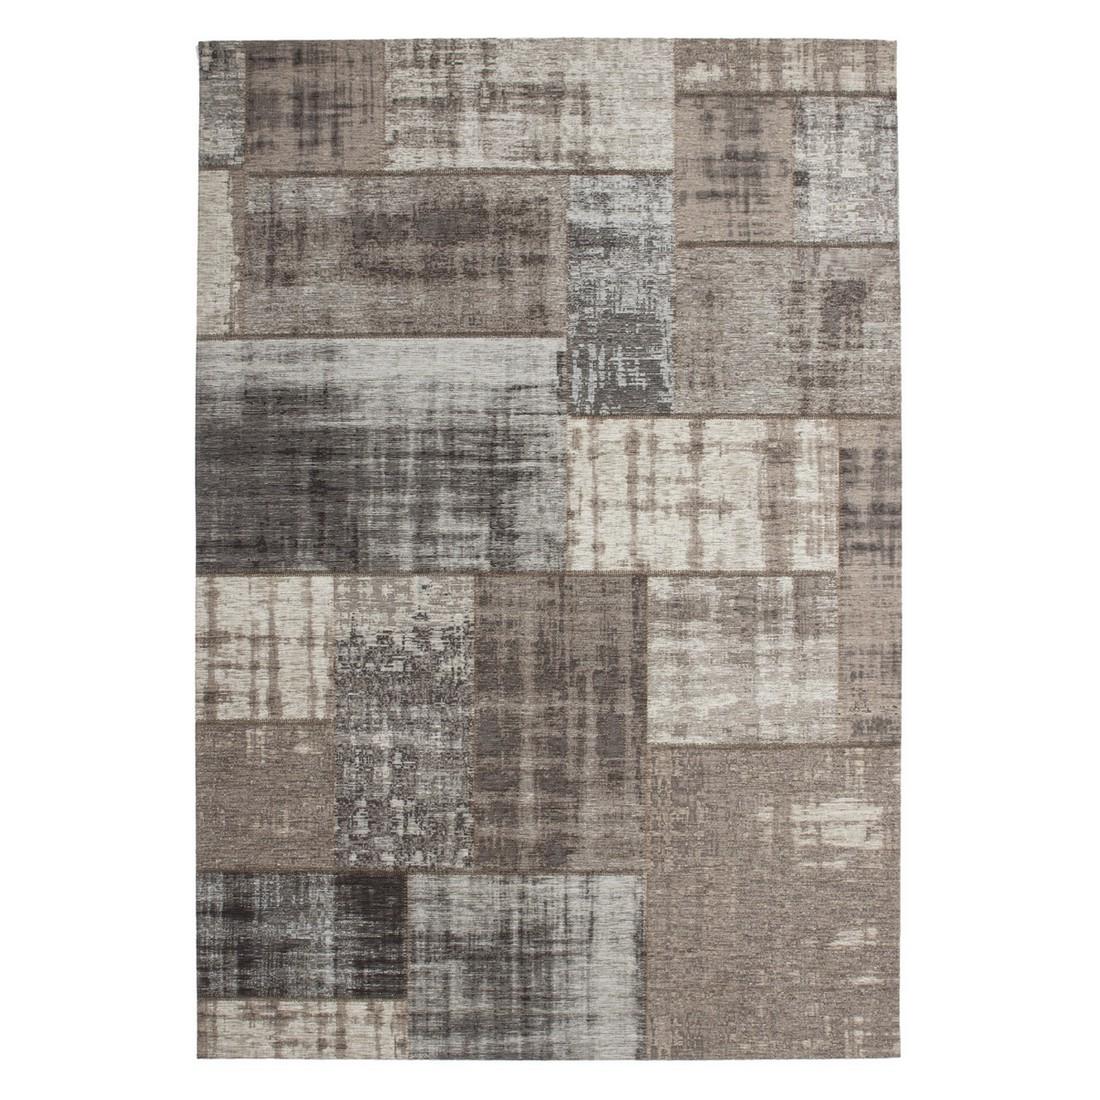 Teppich Spa I – 120 x 170 cm, Obsession online bestellen